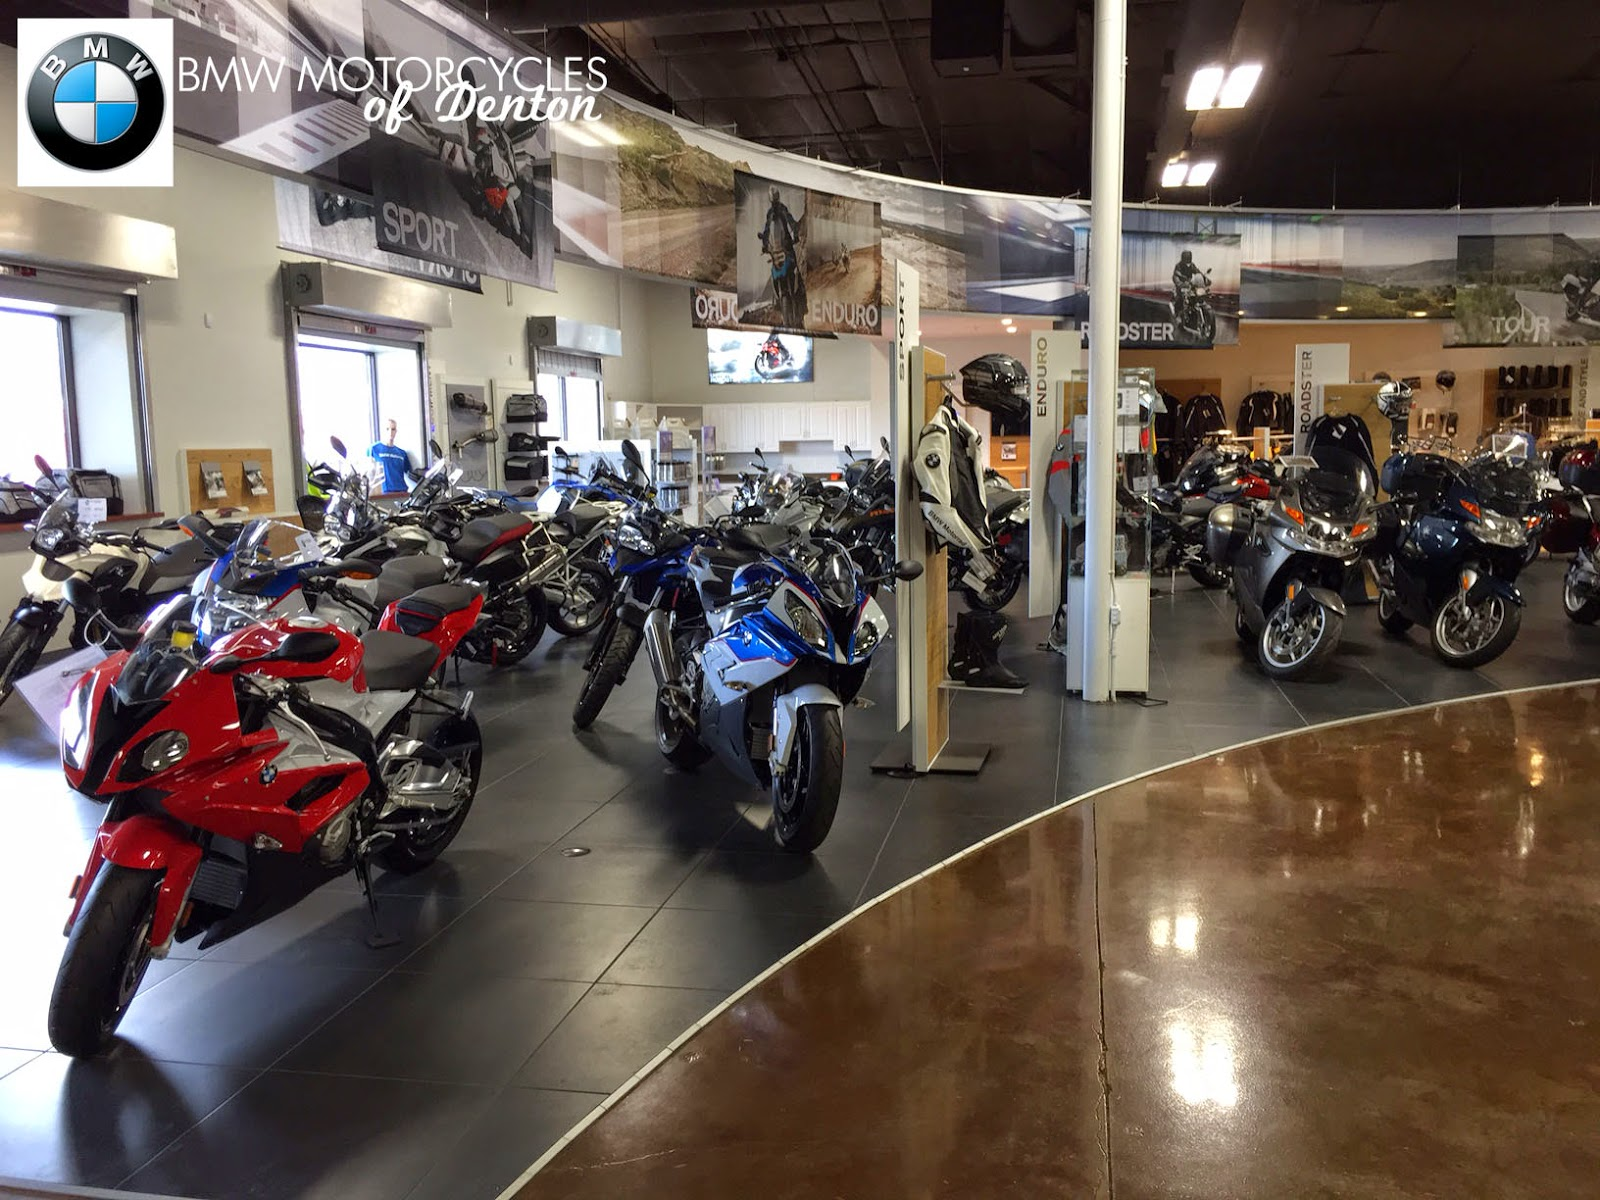 cycle center of denton: check out bmw motorcycles of denton the blog!